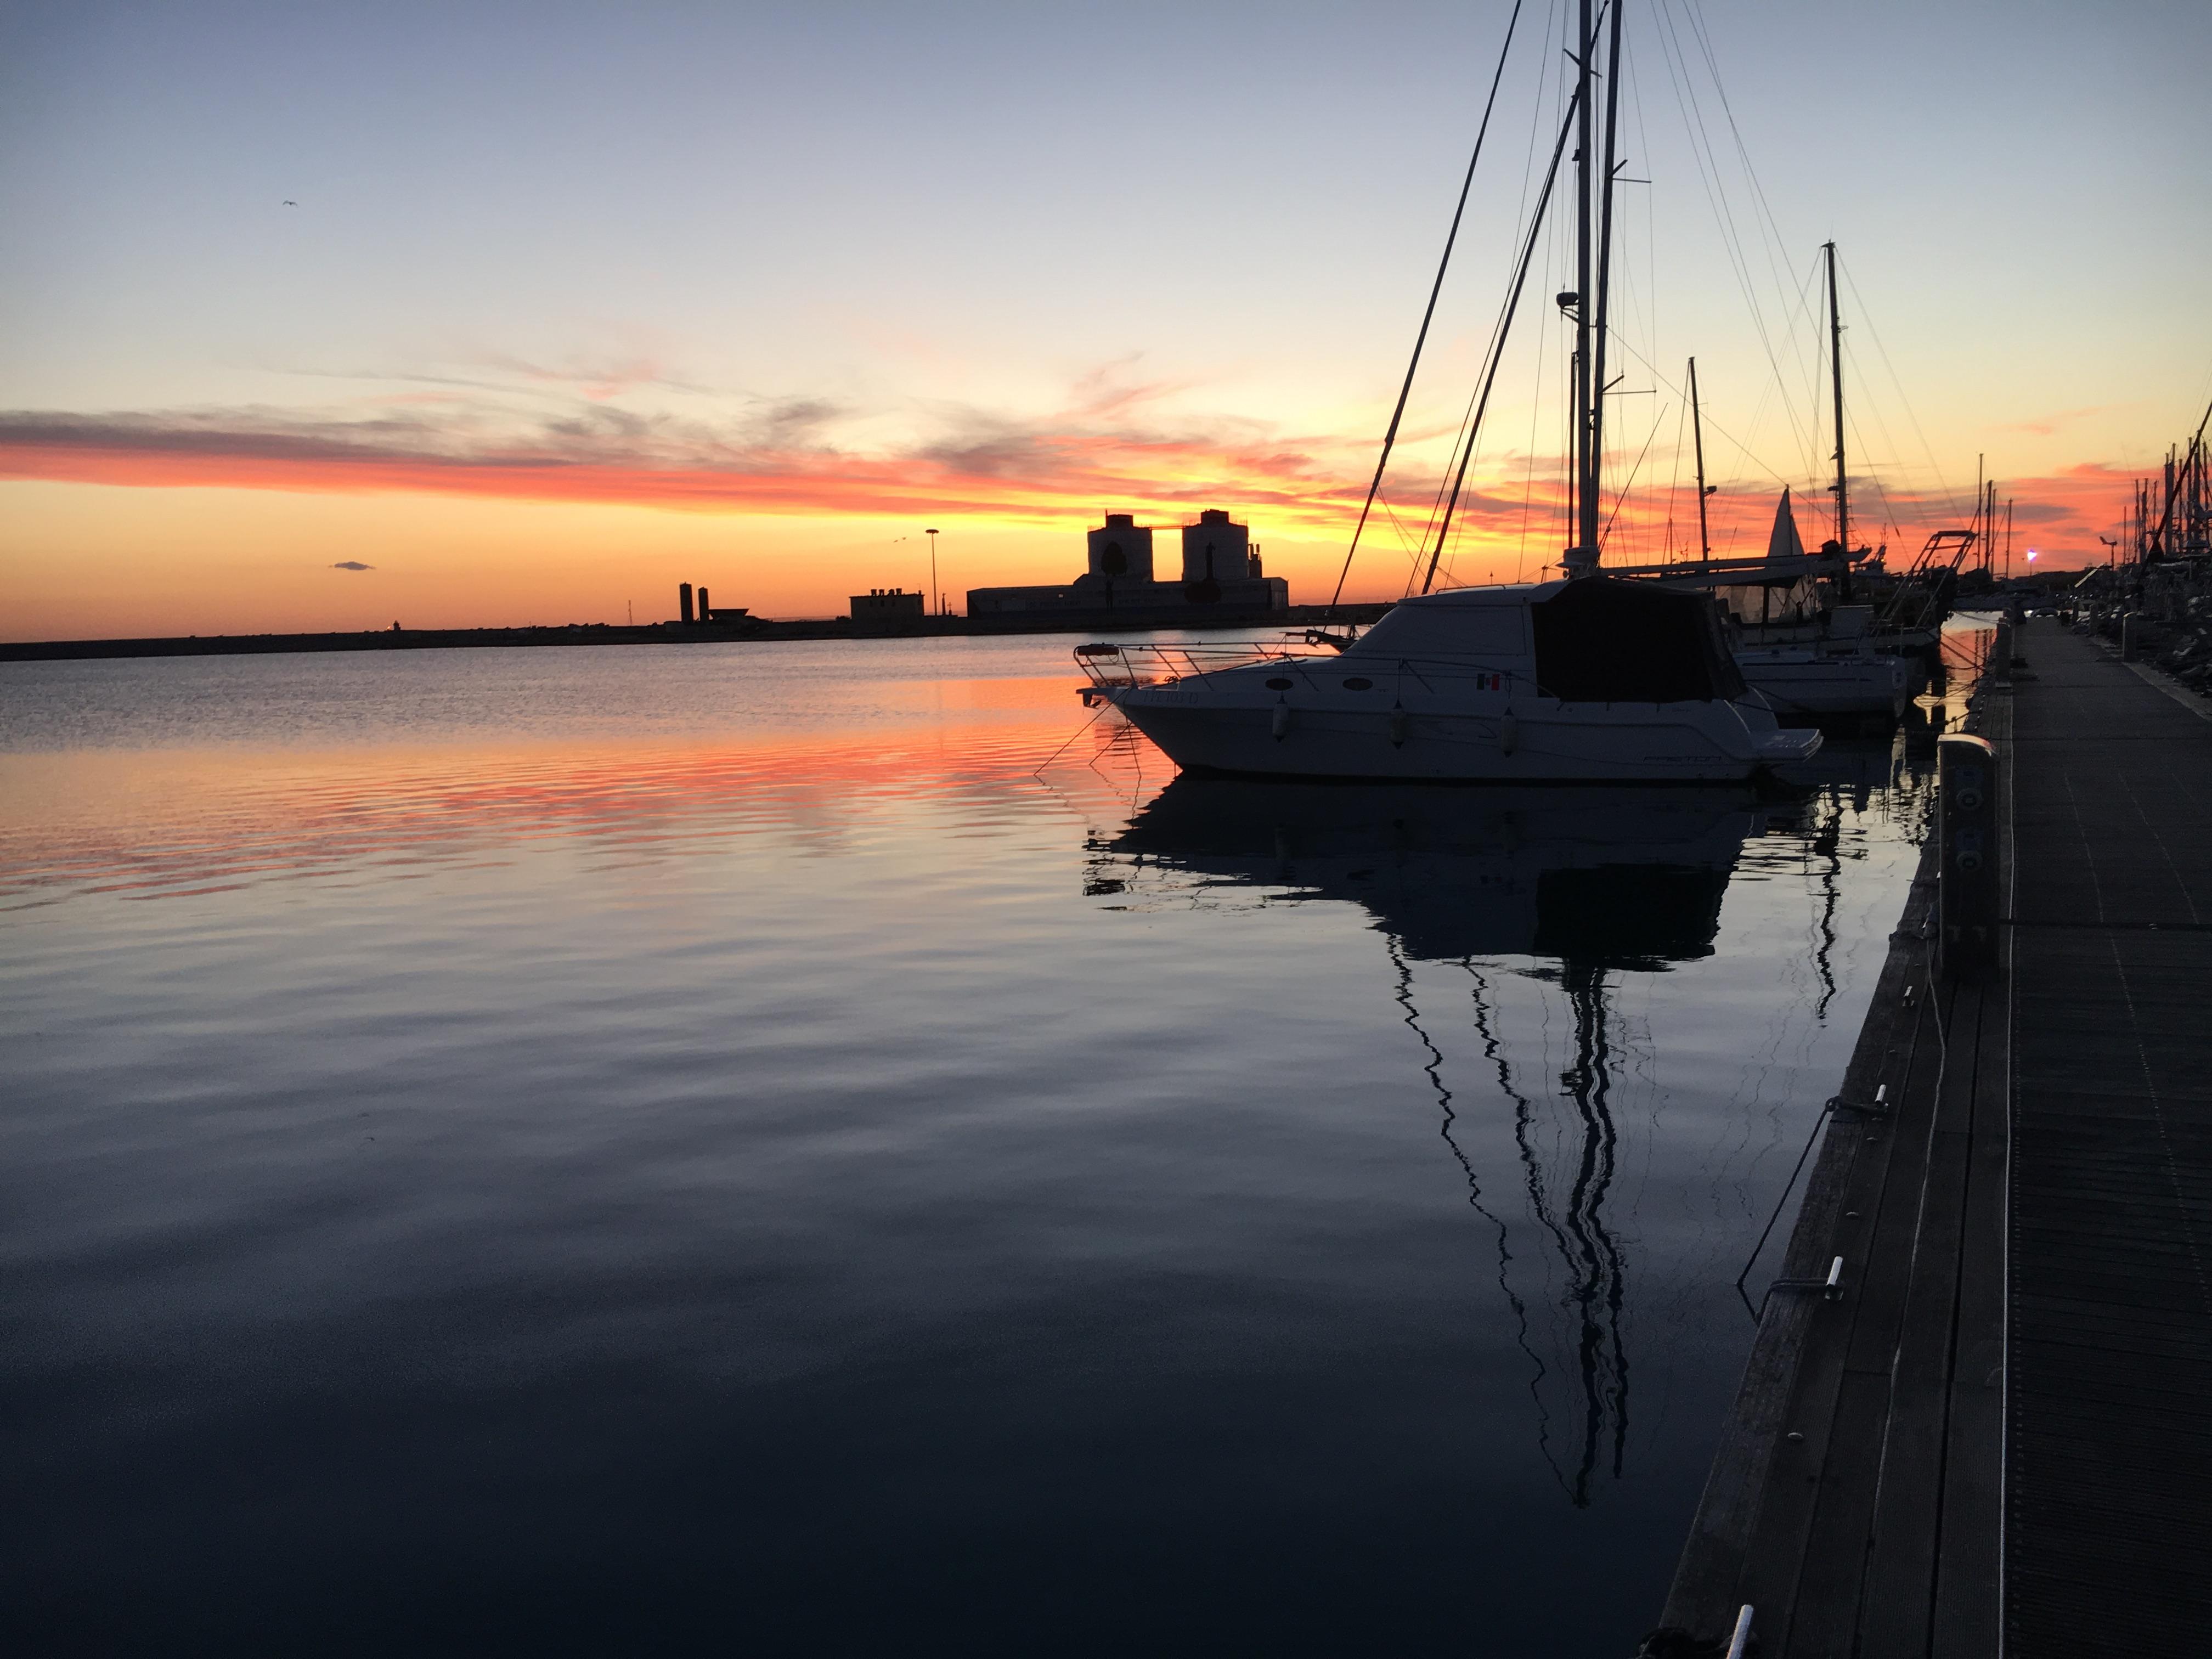 Licata Sunset